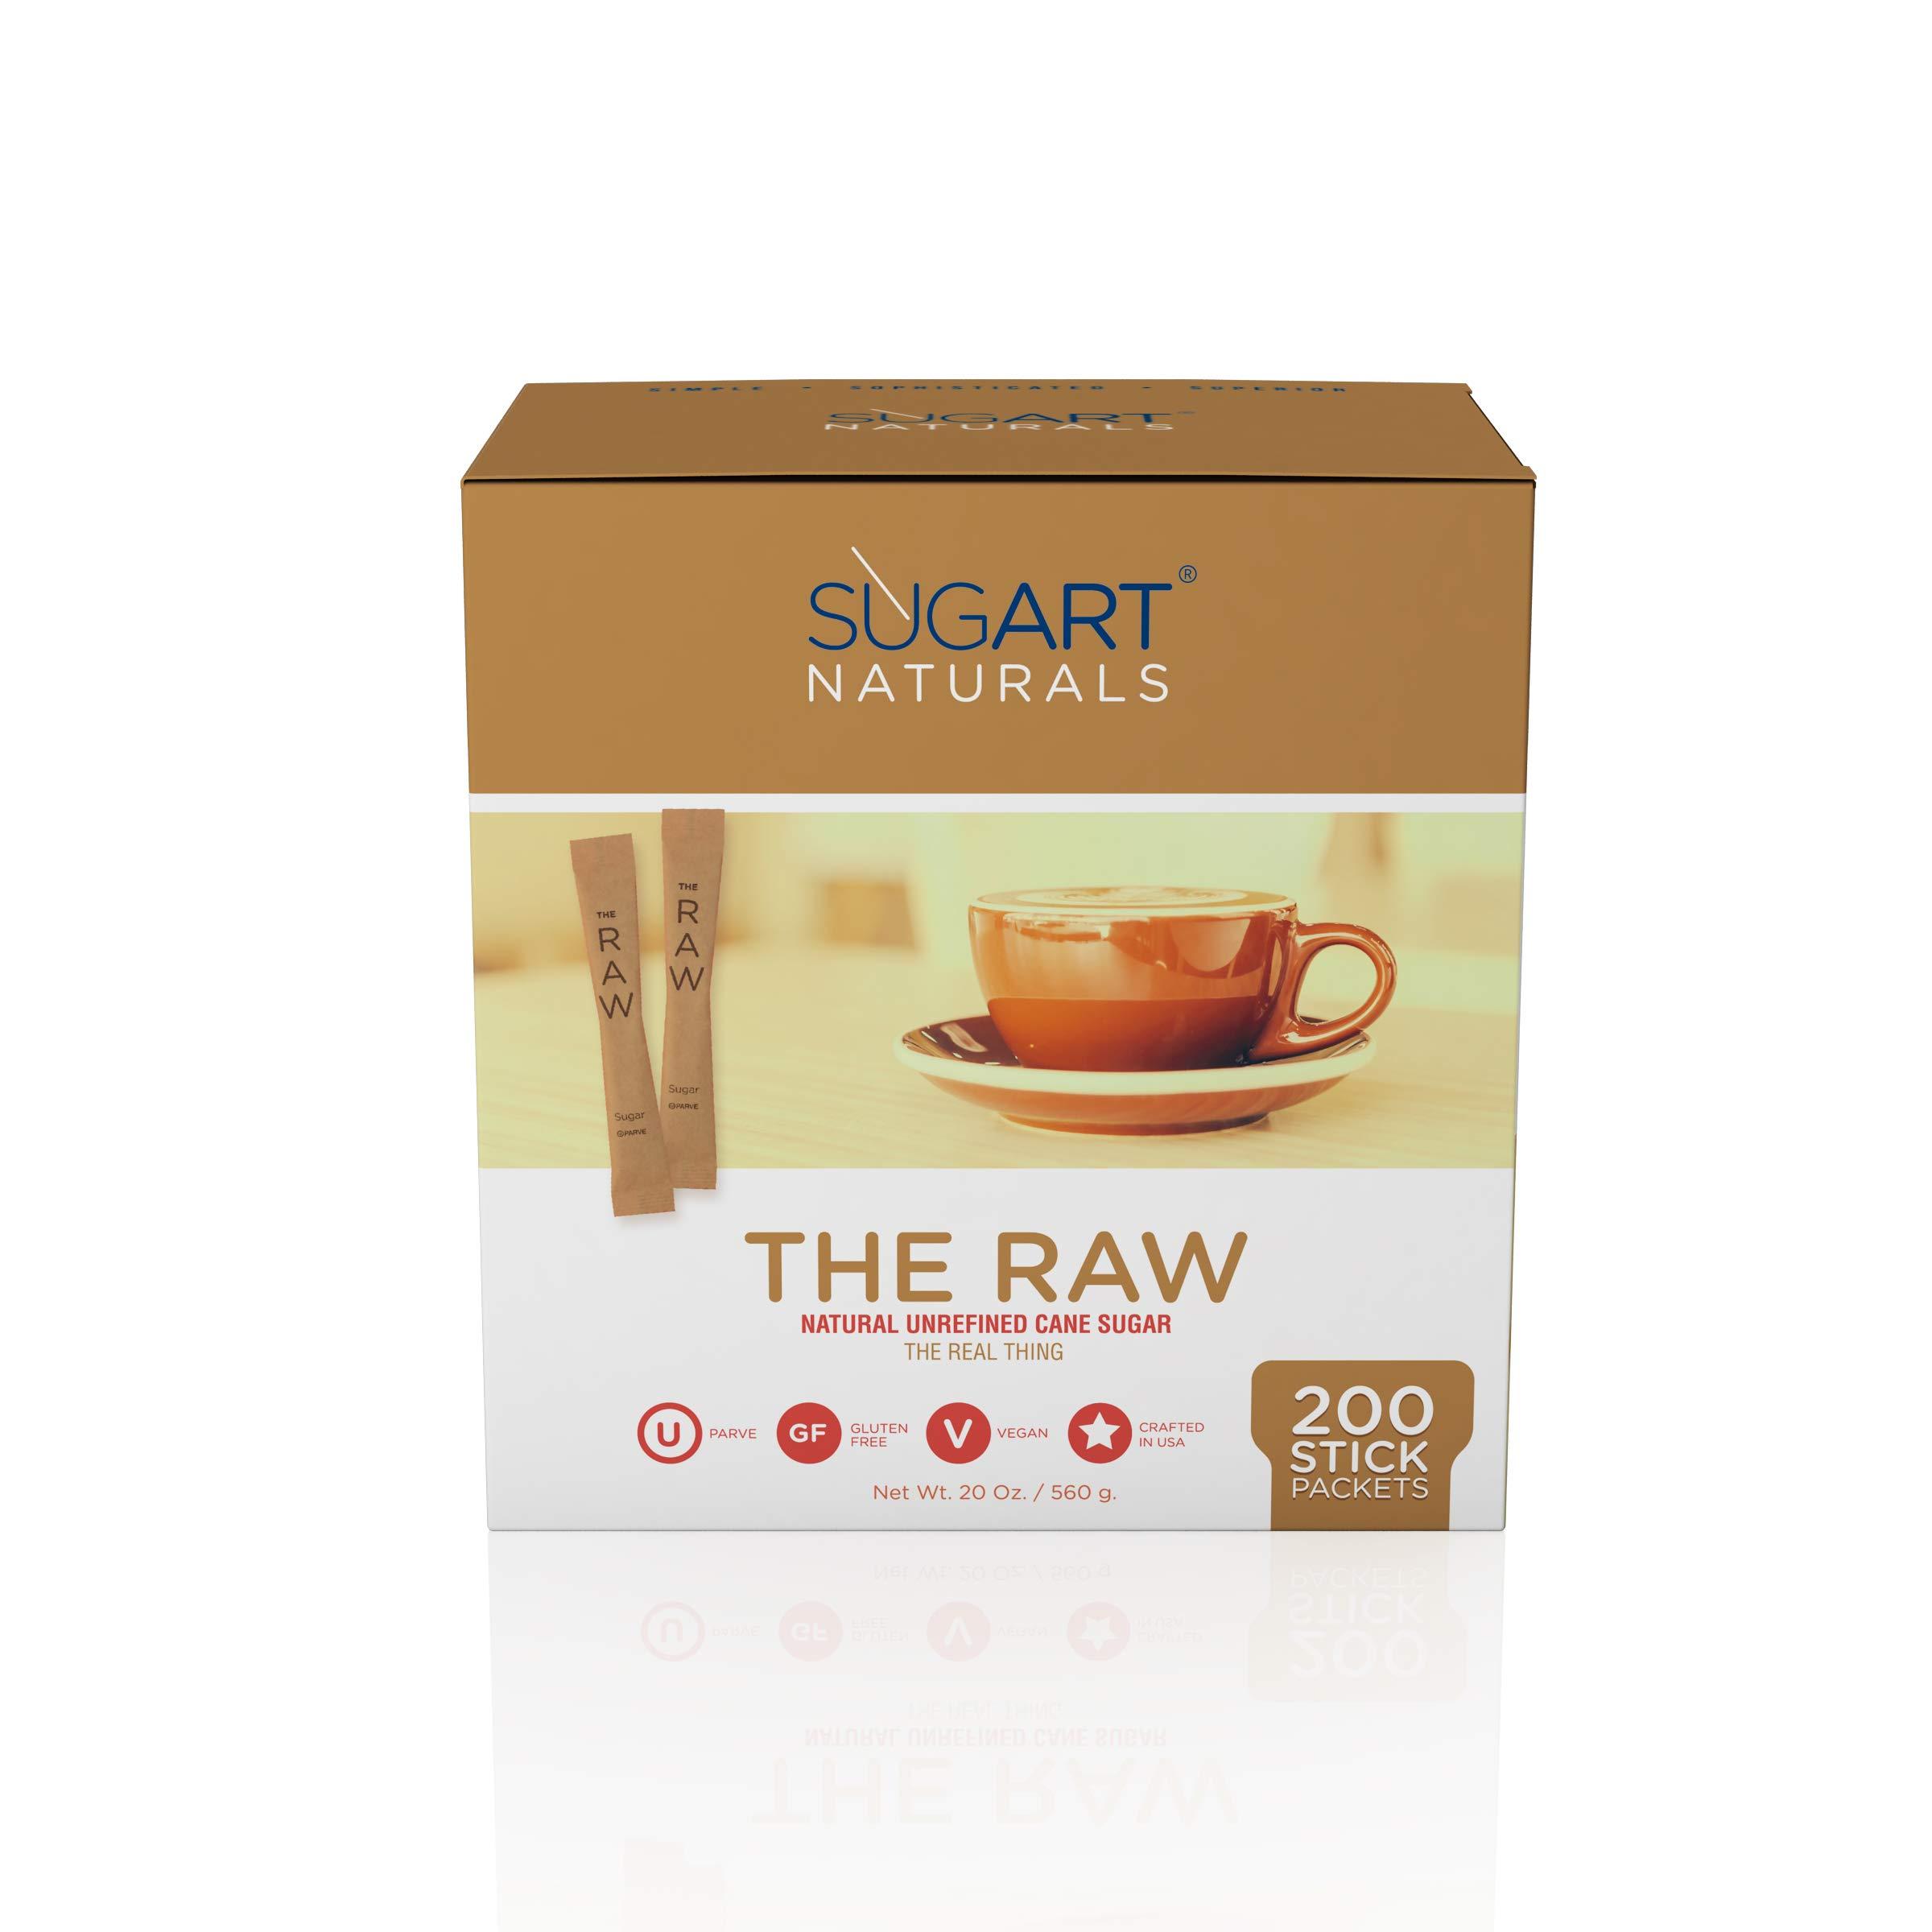 SUGART - THE RAW SUGAR - 200 Individual Serving Stick Packets - U Parve/Kosher by SUGART (Image #3)